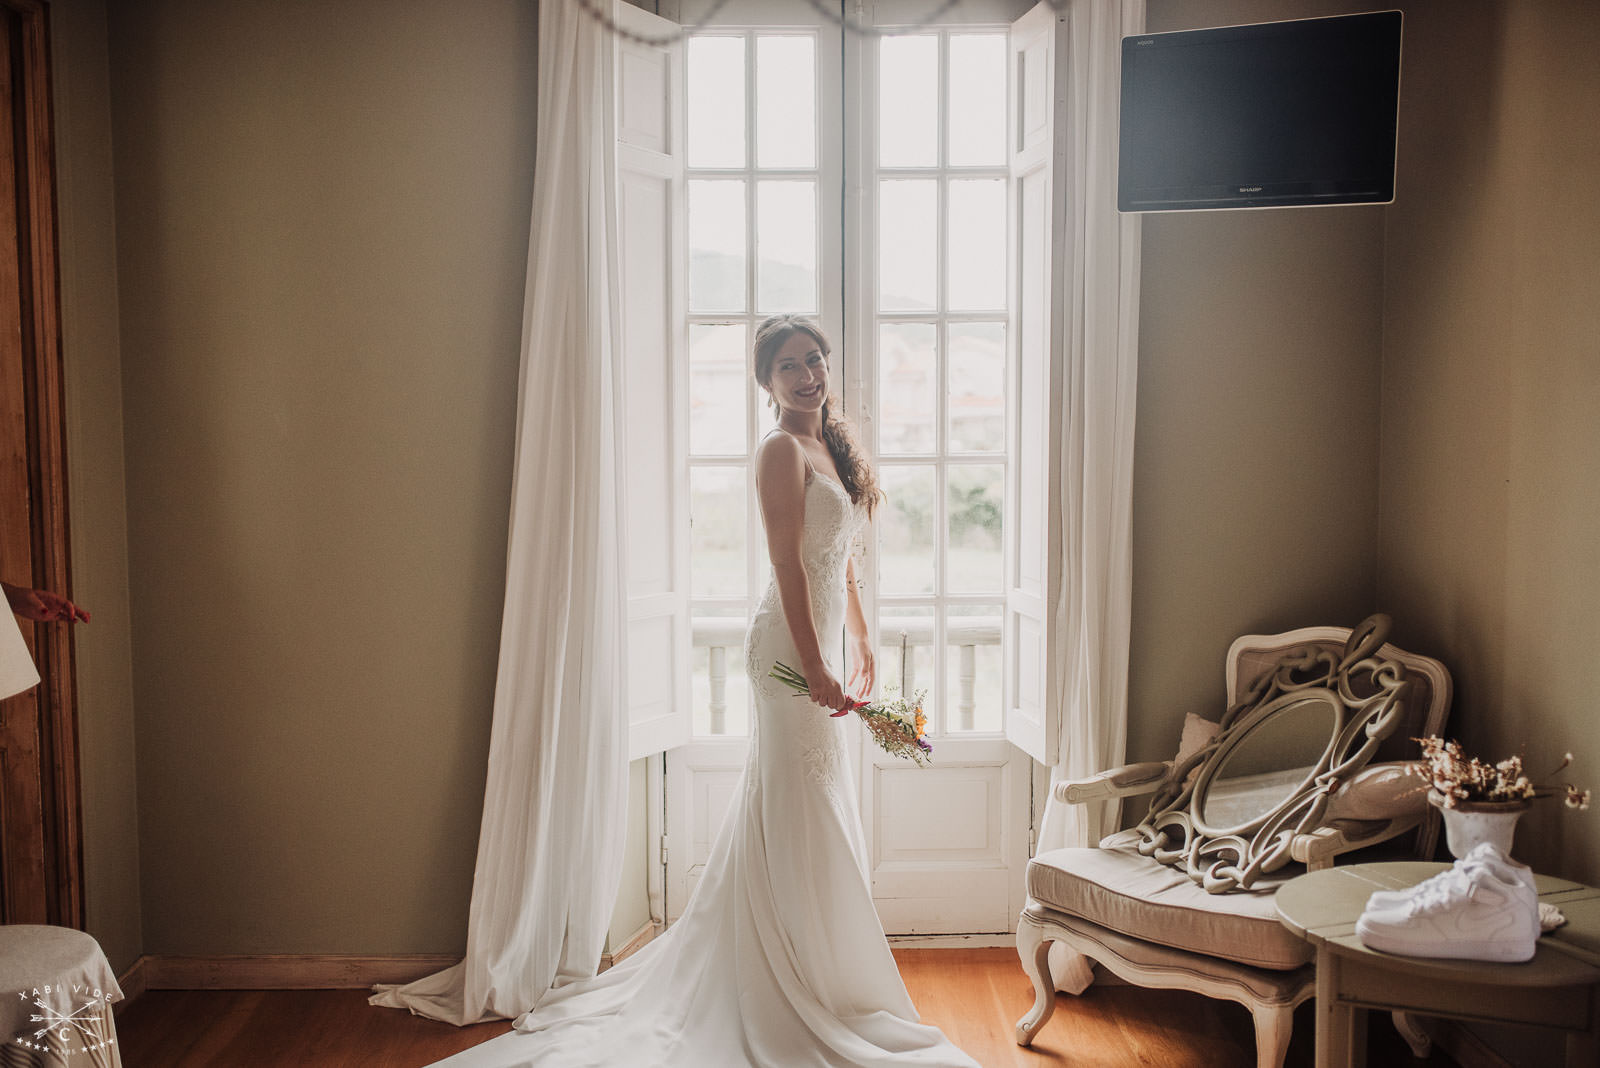 boda en la hosteria de arnuero-59